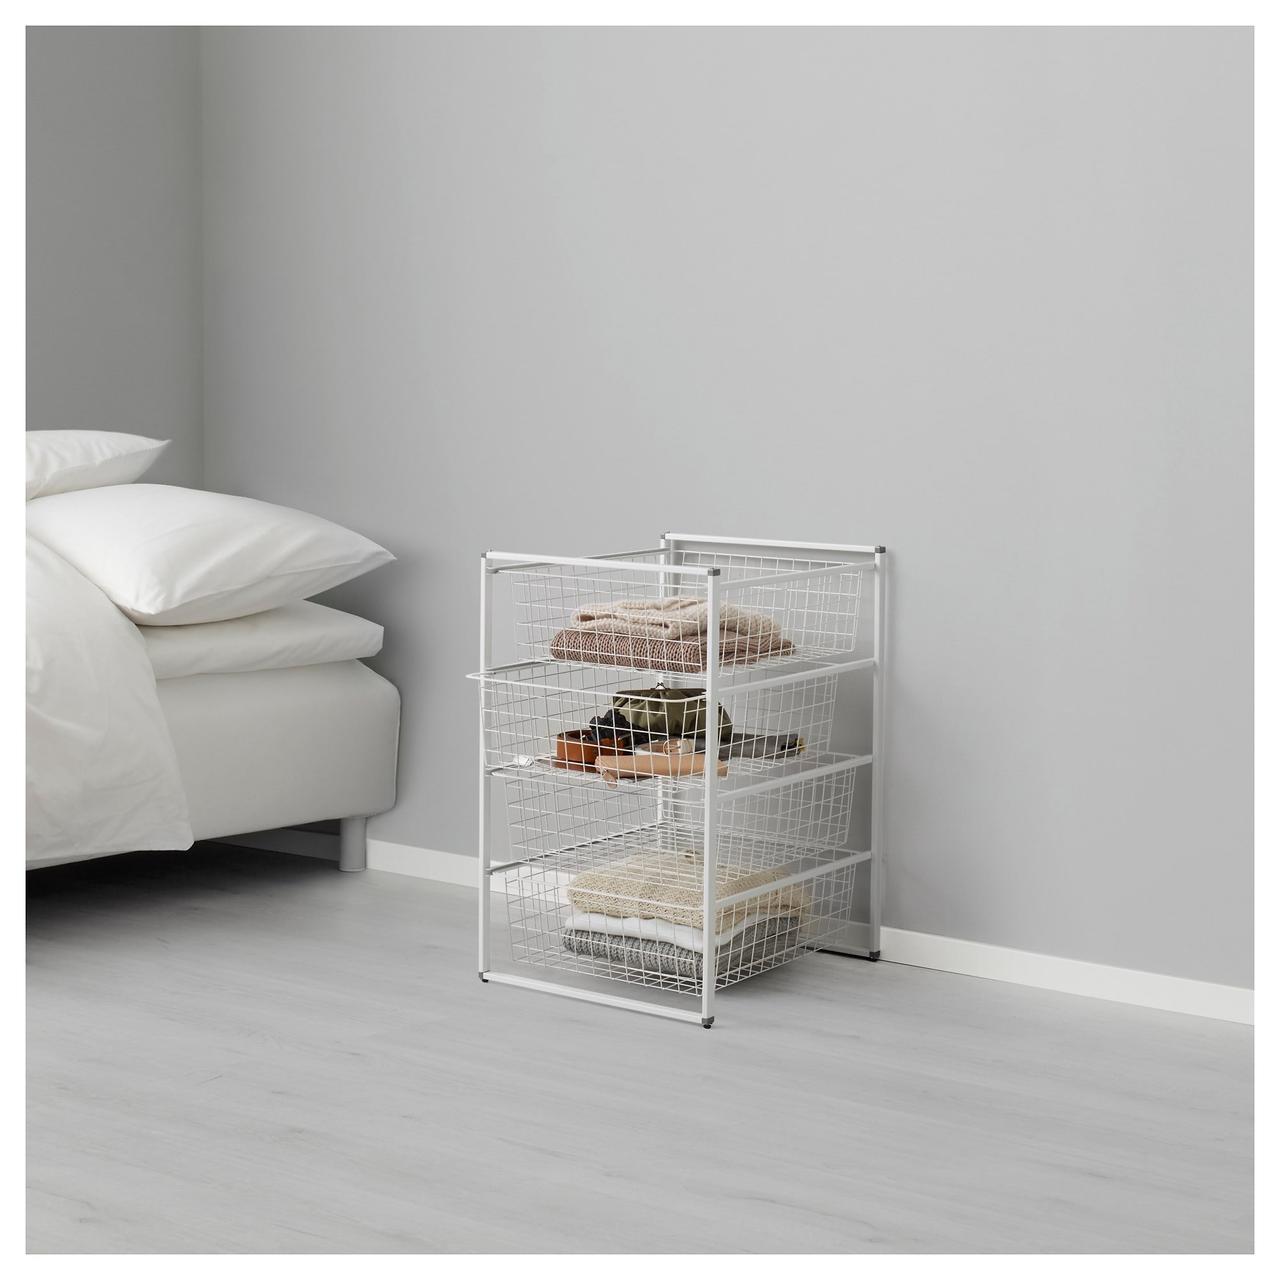 IKEA ANTONIUS Стеллаж с корзинами, белый  (198.764.54)